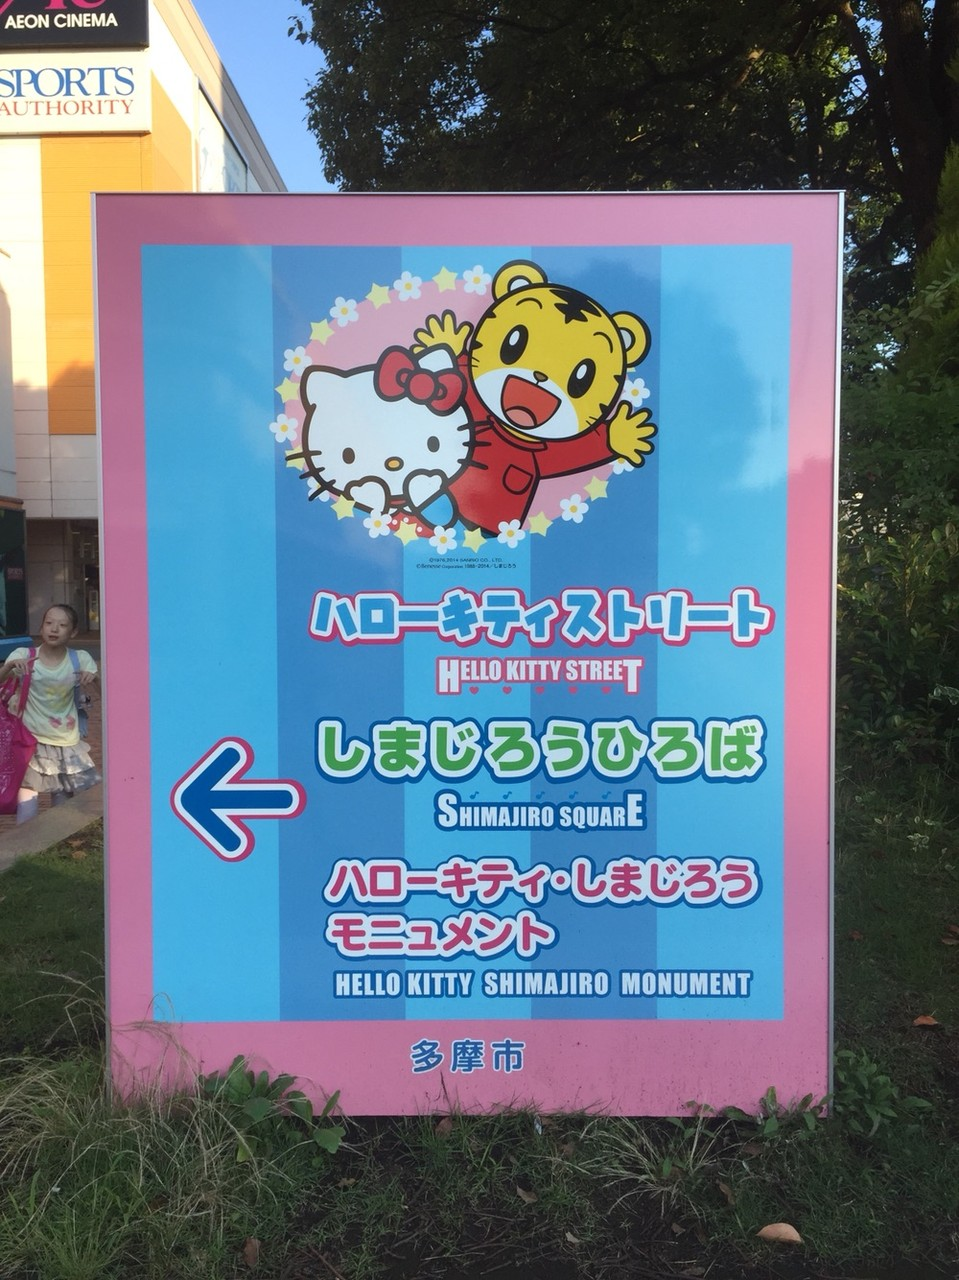 Direction to Hello Kitty Street Tokyo Tama